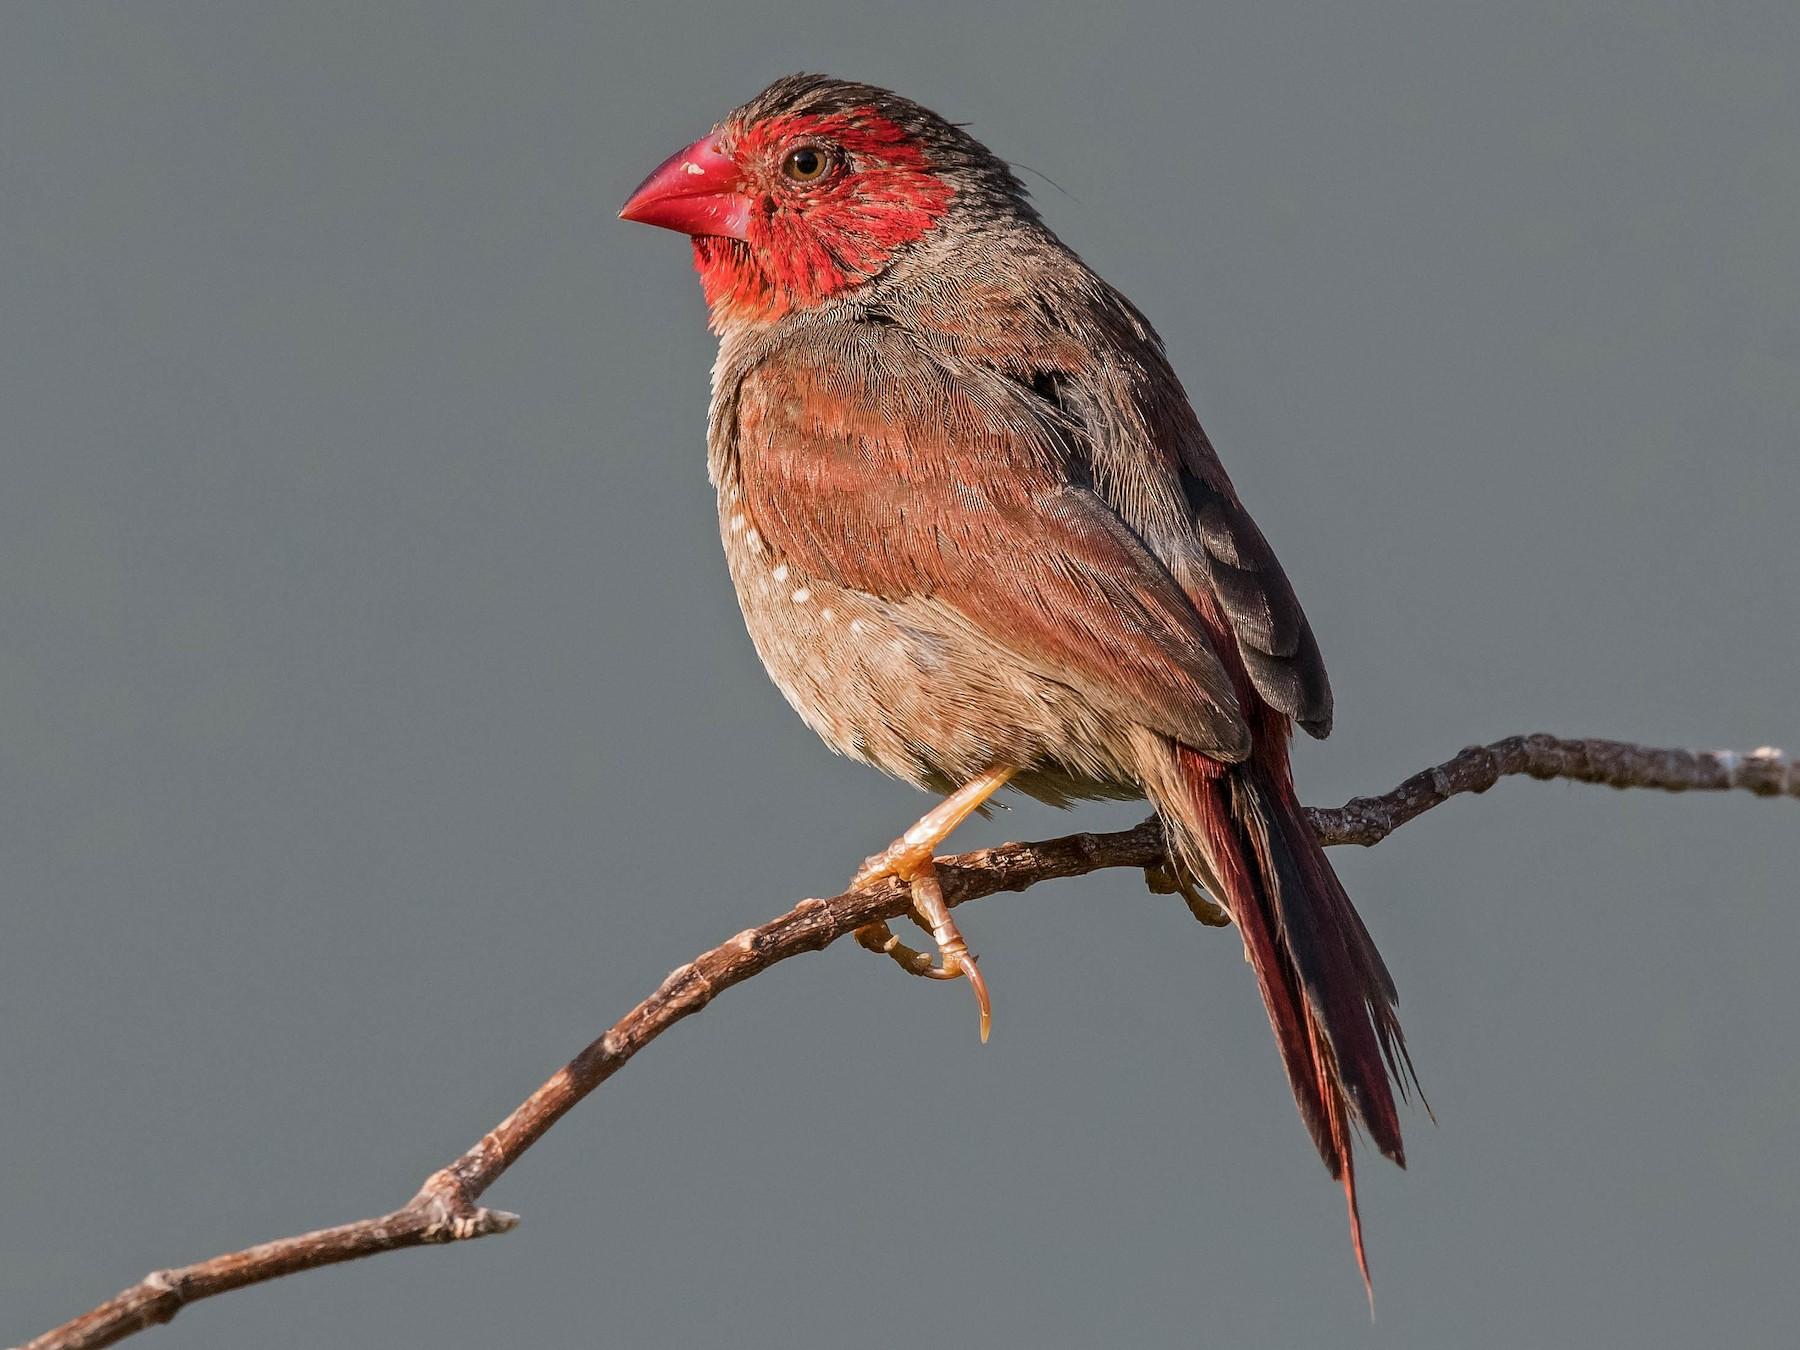 Crimson Finch - Terence Alexander